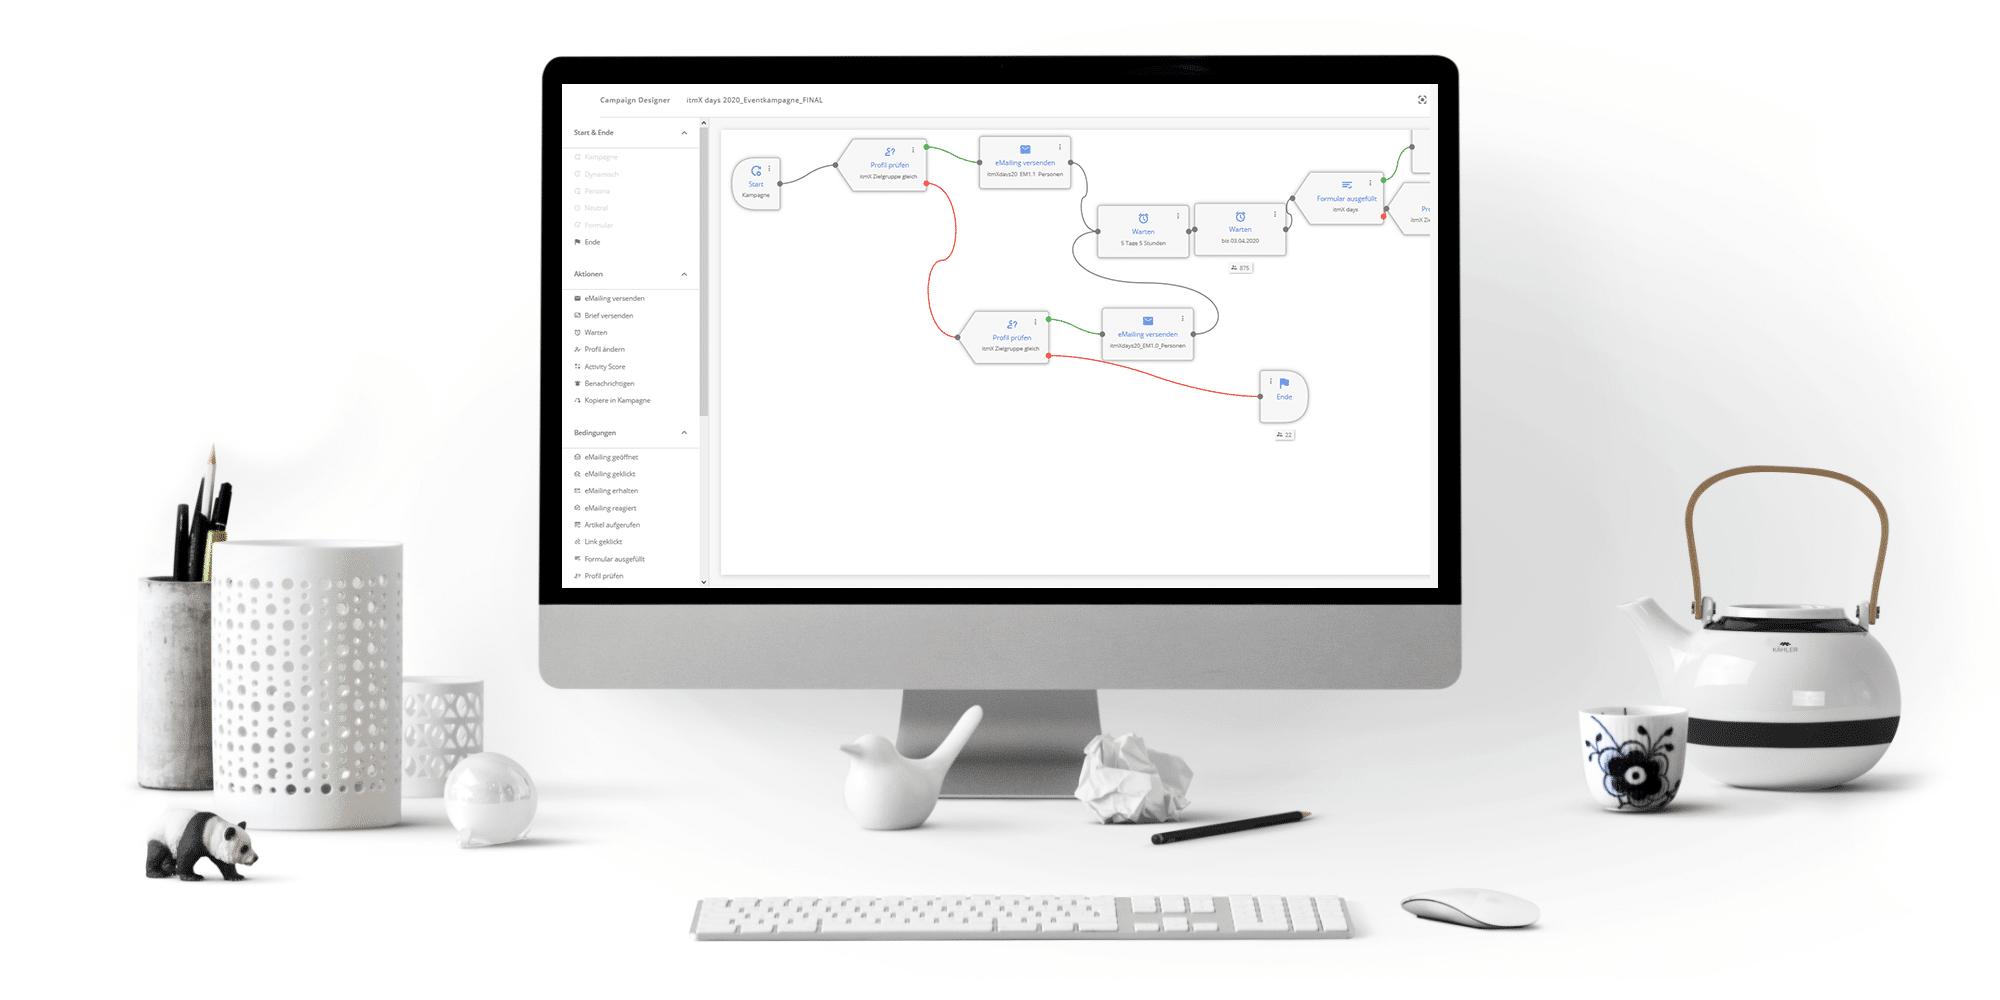 itmx marketing automation kampagnenplanung Screen